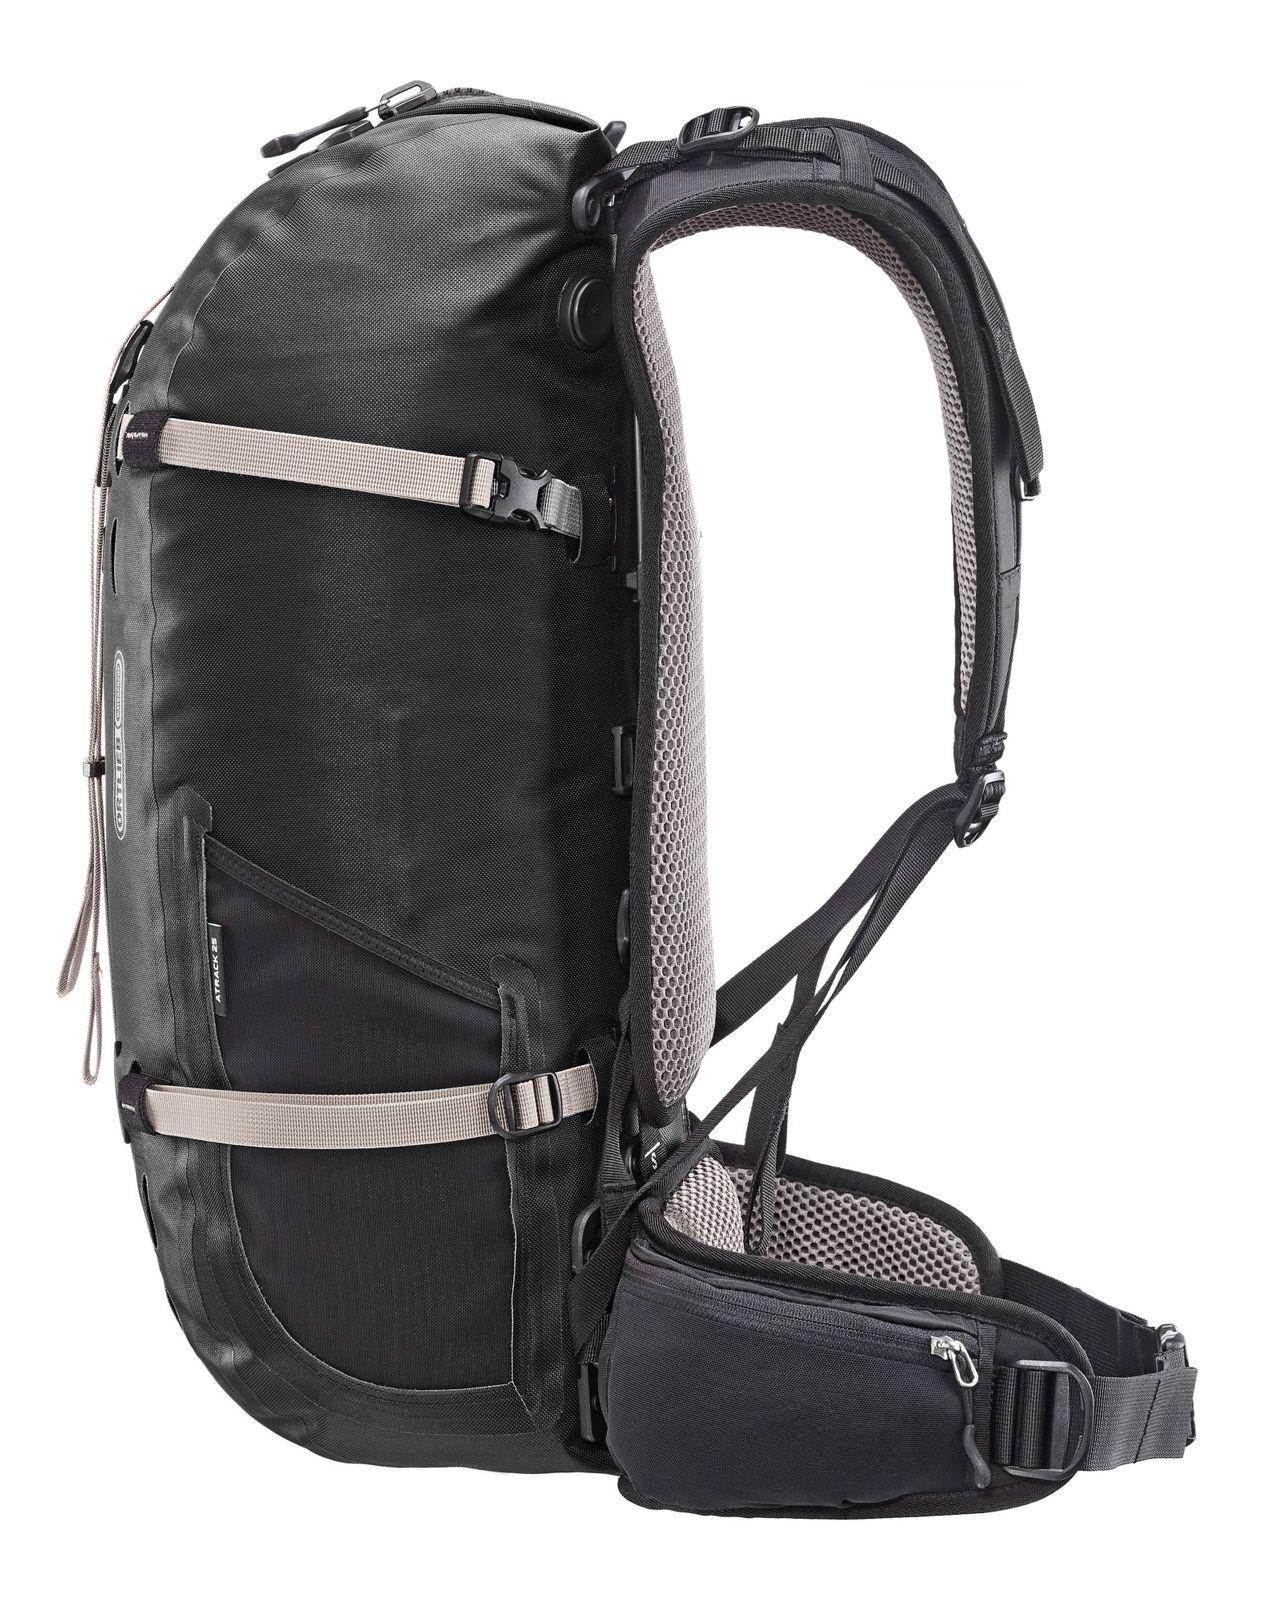 ORTLIEB Atrack Bike / Outdoor Backpack 25L Black